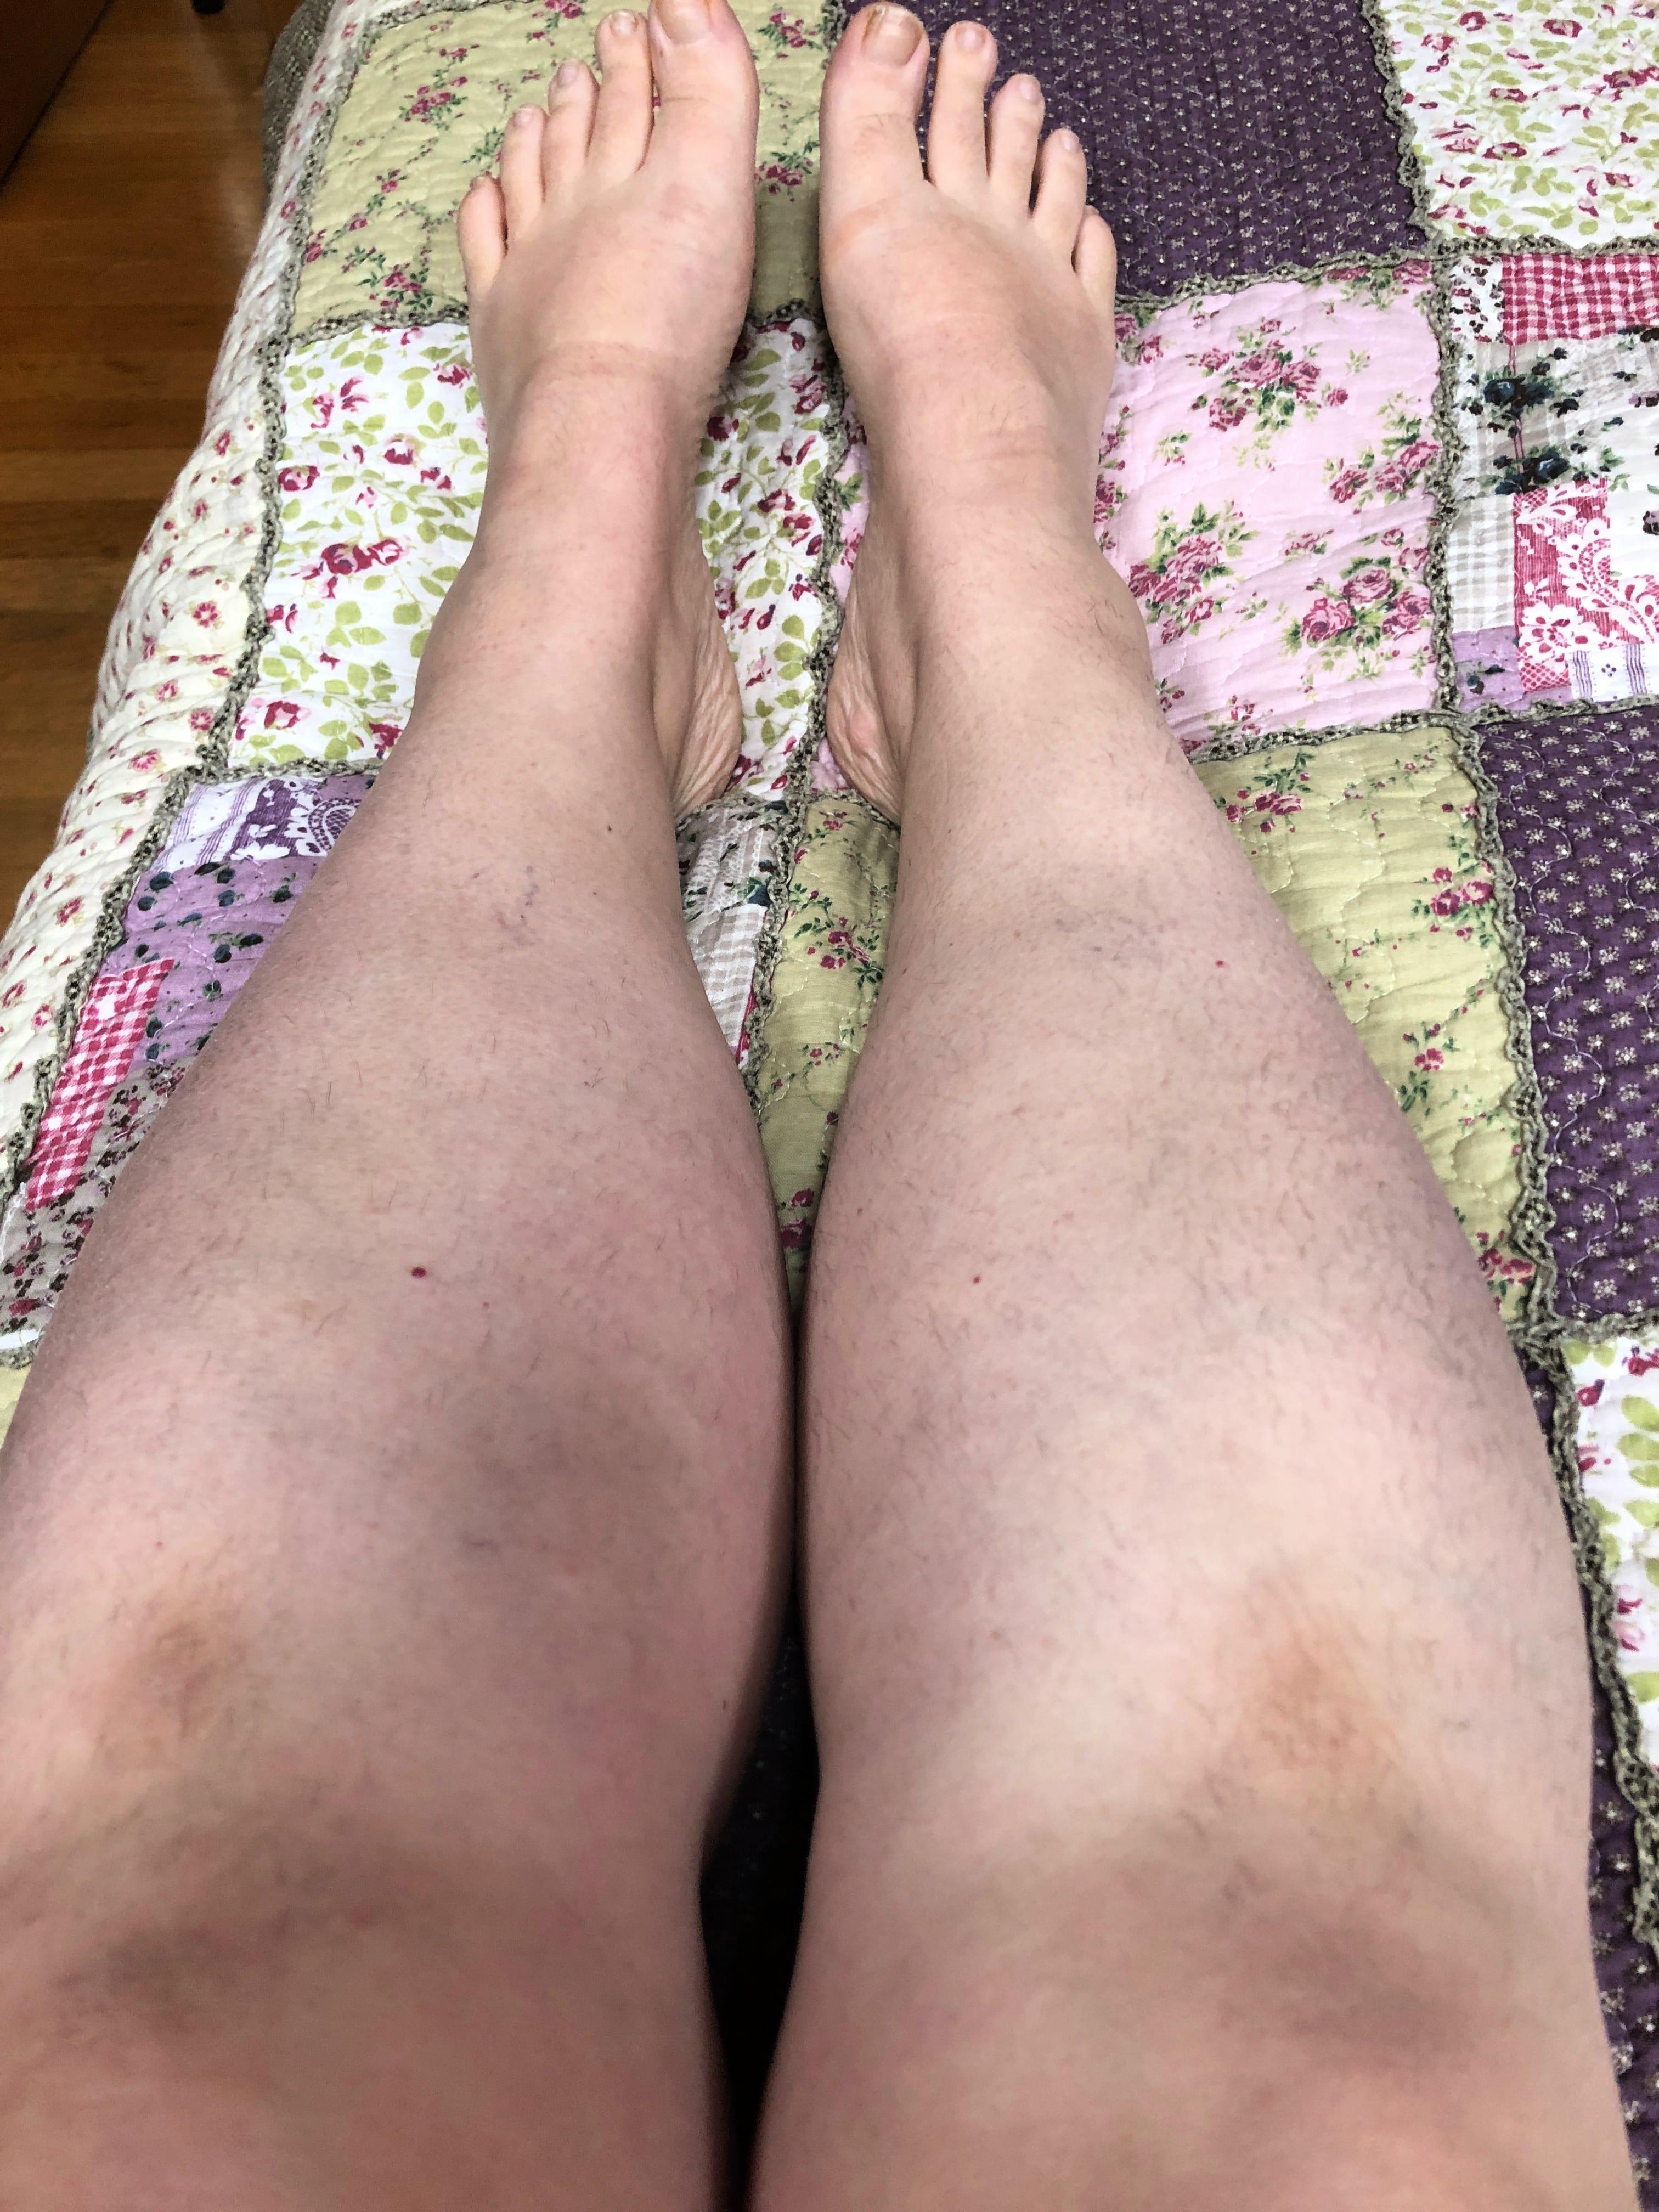 Legs 7 April 2019